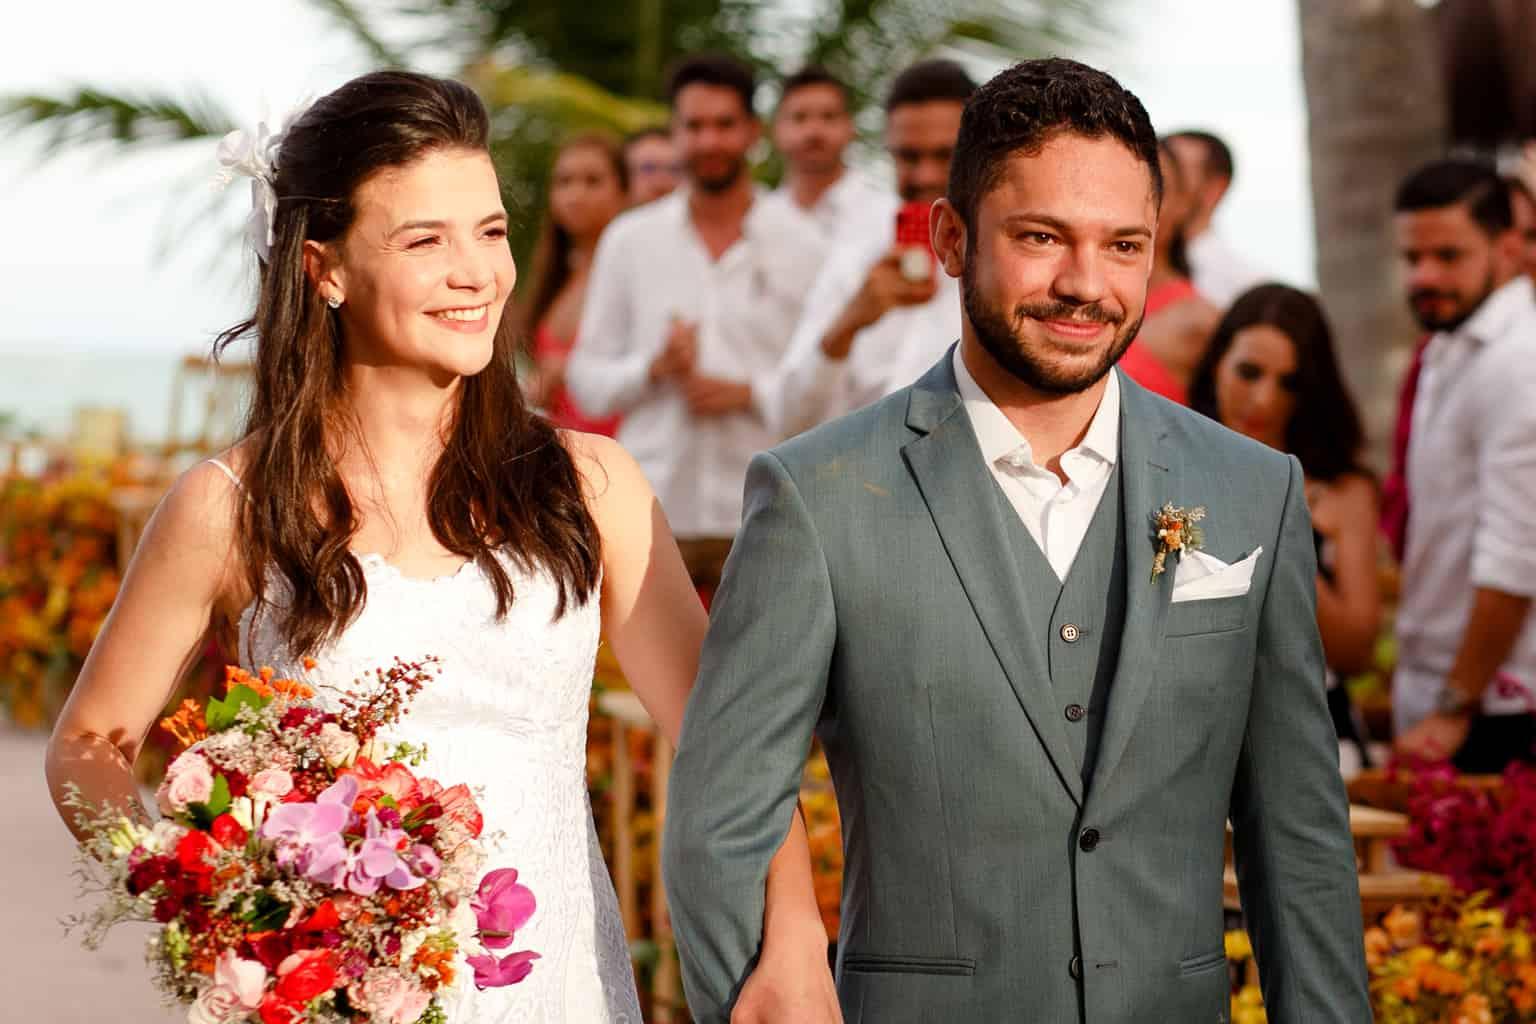 Casamento-Emanuelle-e-Alysson-Fotografia-Tadeu-Nanó-e-Luca-Antunes116